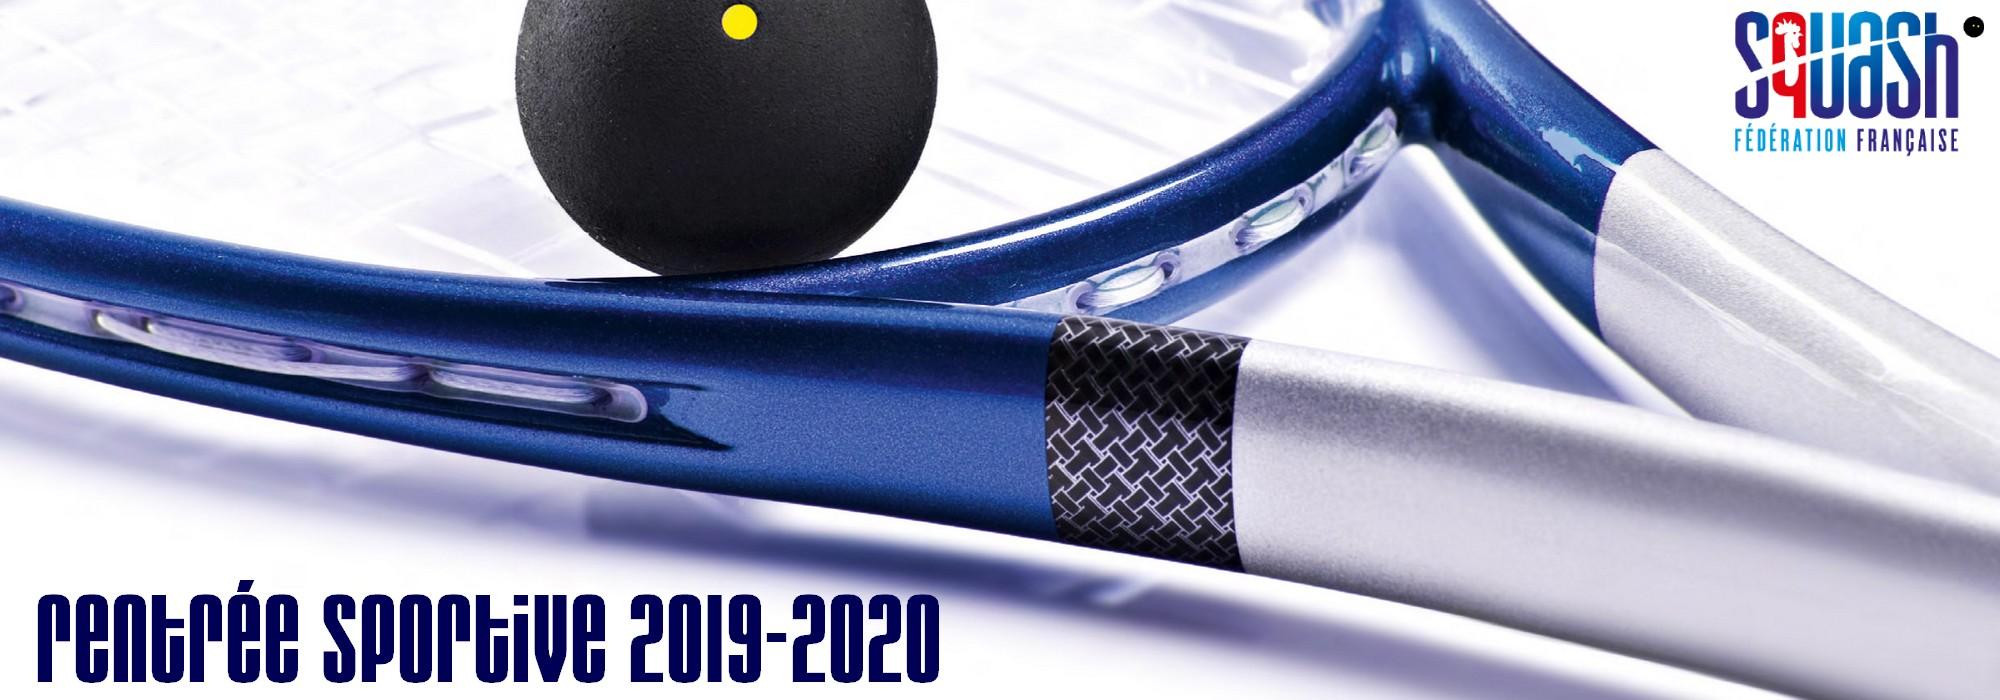 Calendrier Ramadan 2019 Montpellier.Calendrier Ramadan 2020 Montpellier Calendrier 2020